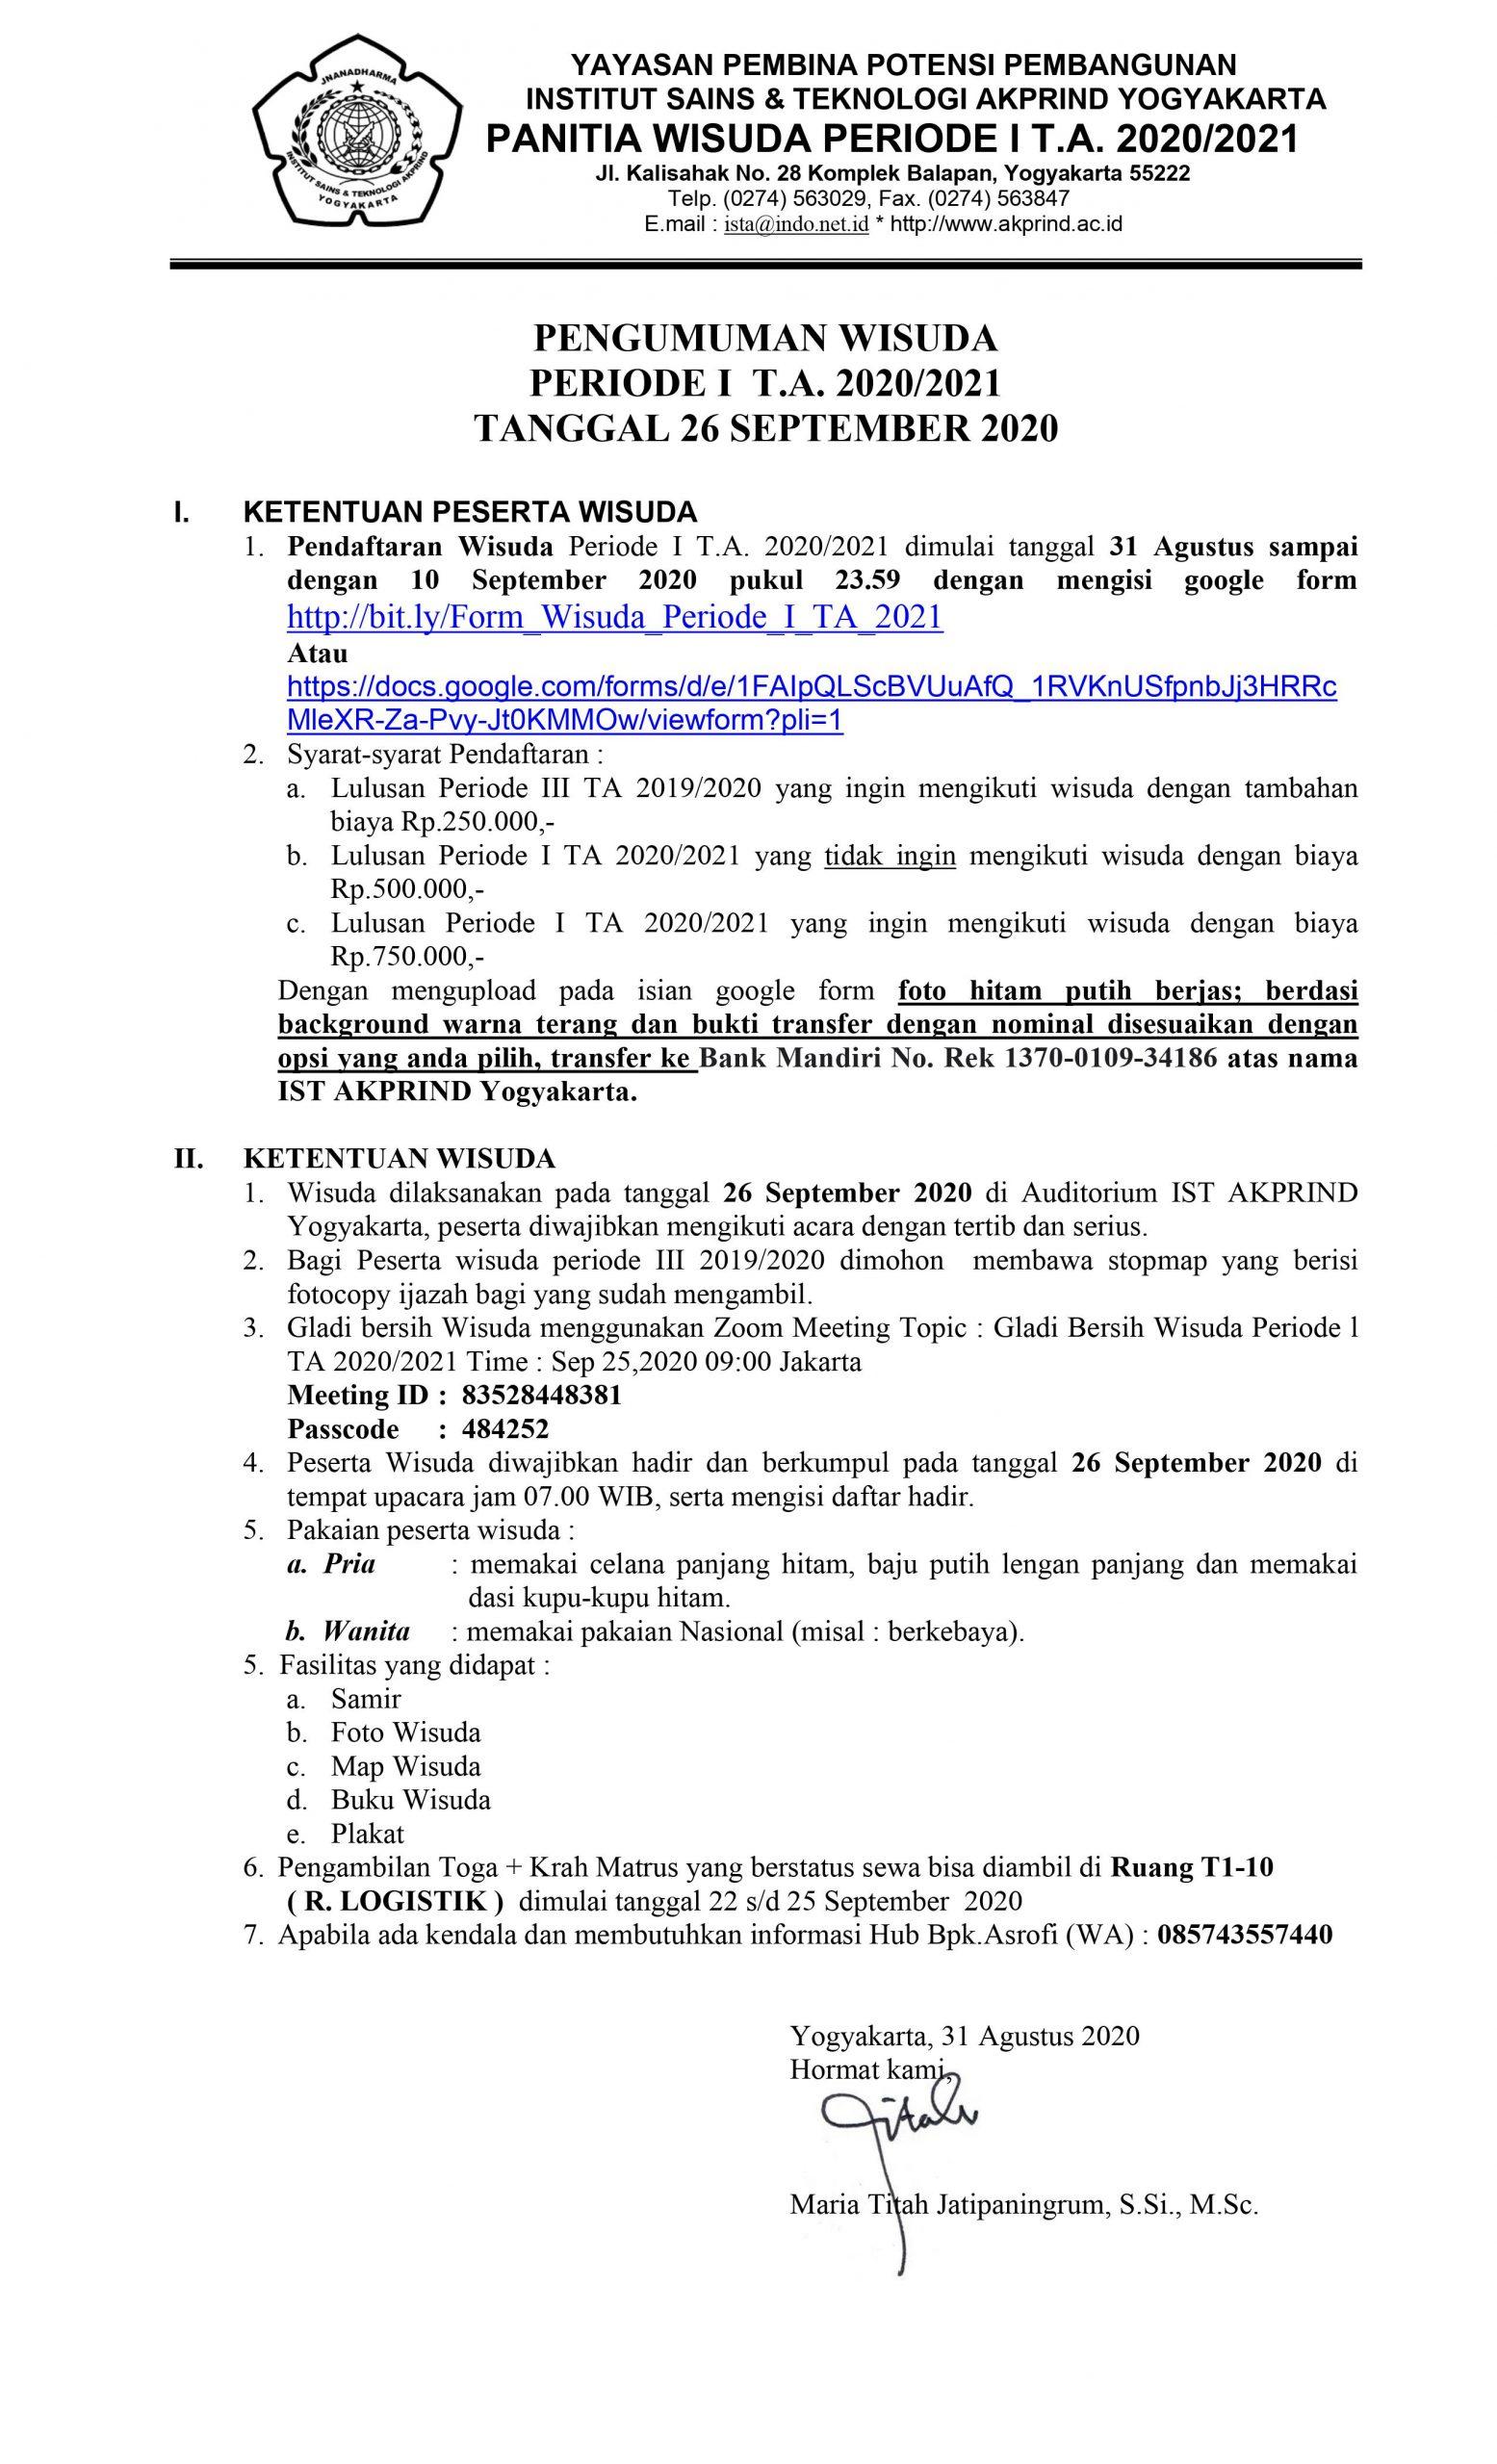 PENGUMUMAN: Wisuda Periode I (September Tahun Akademik 2020/2021)